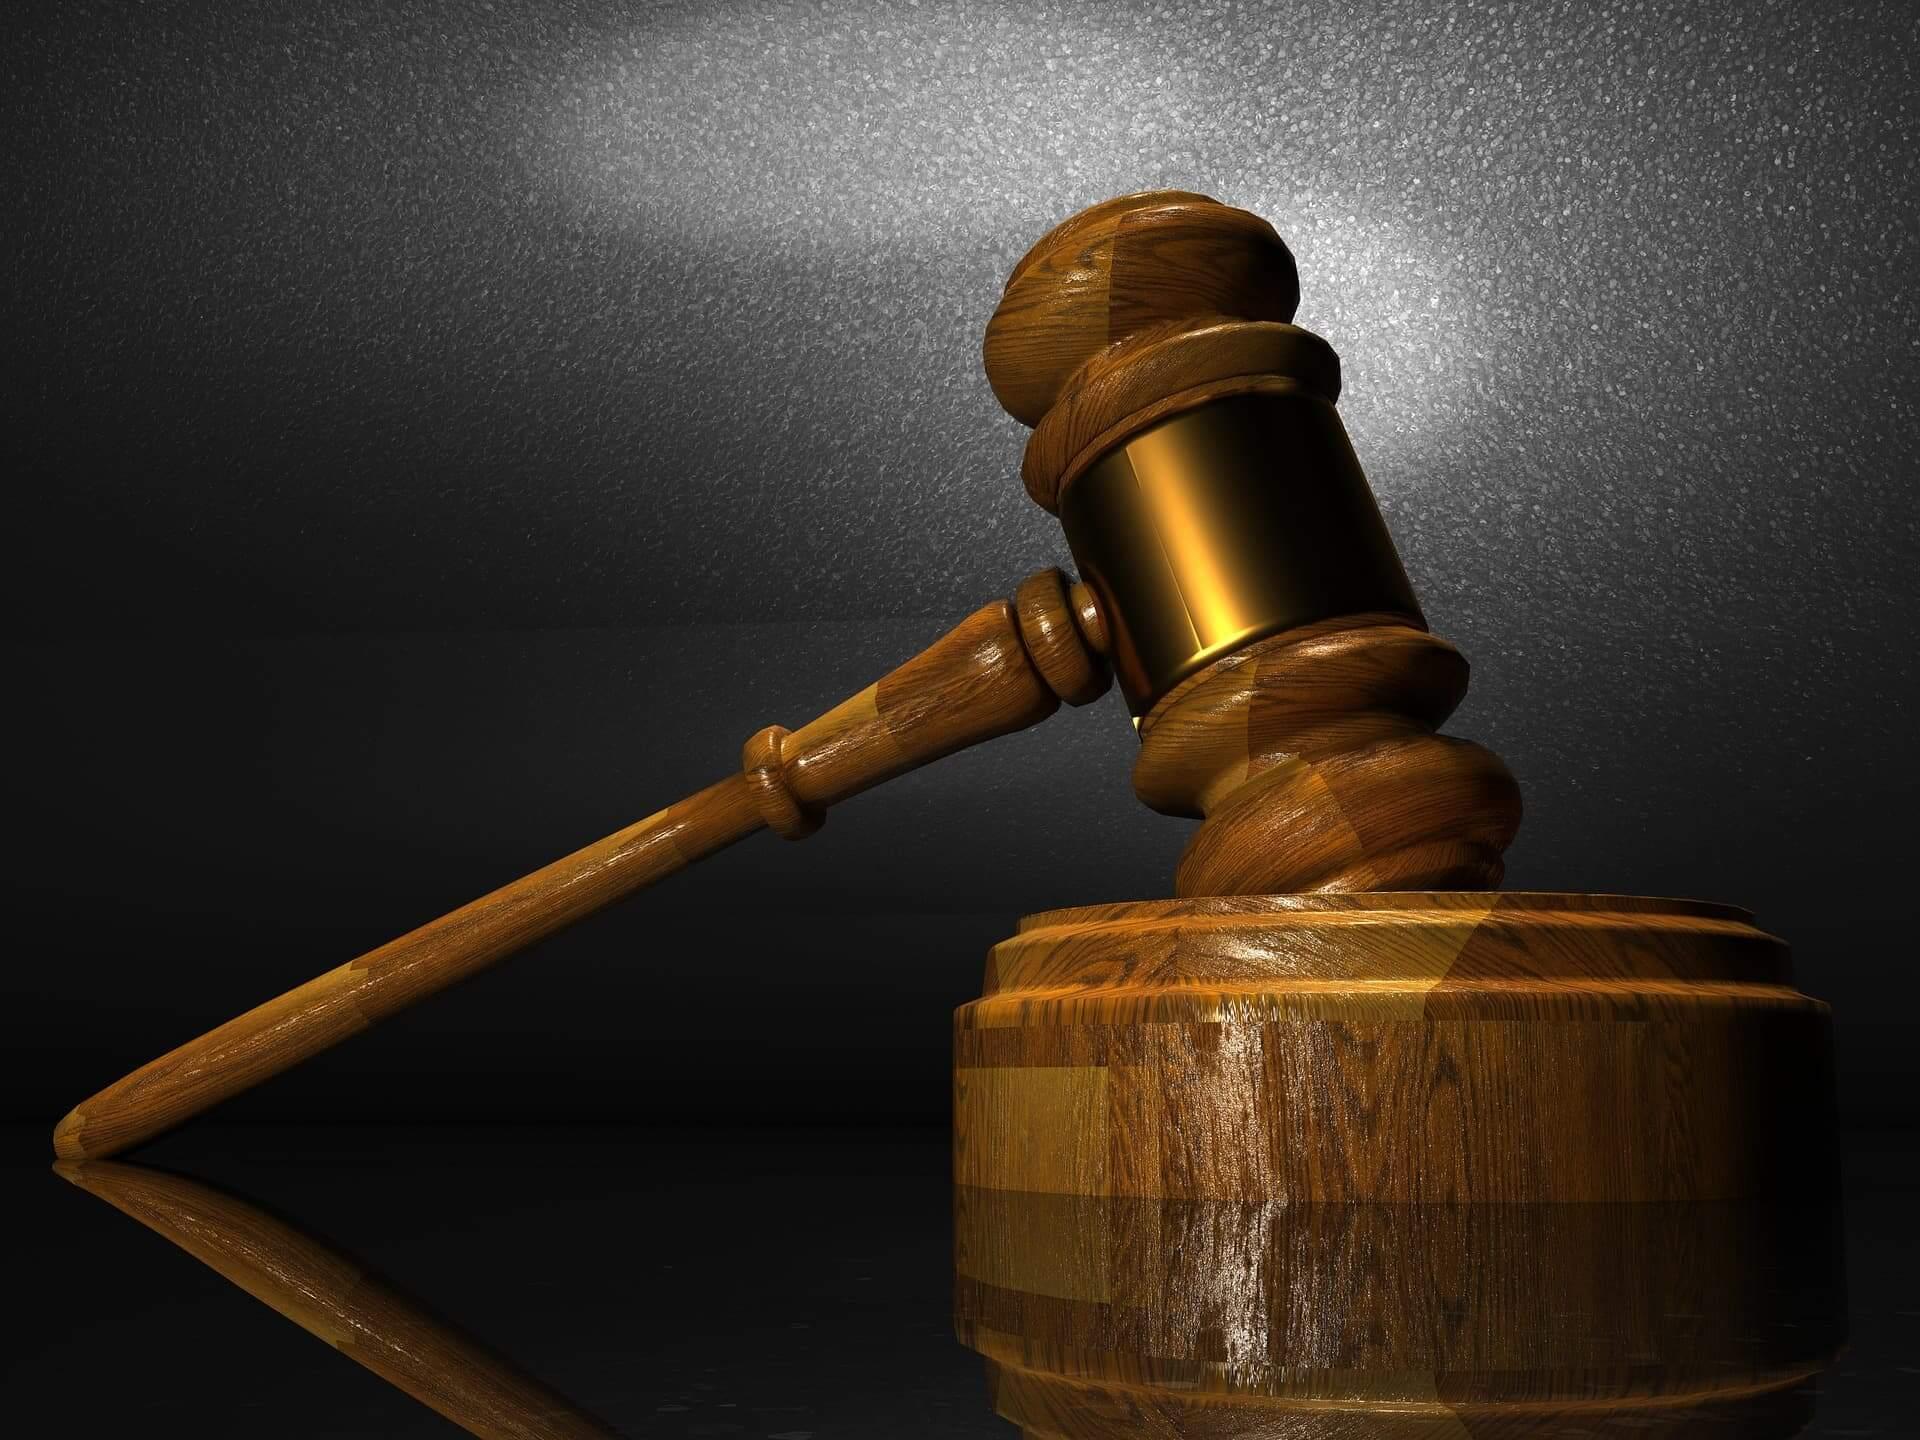 PROVISIONS ESTABLISHING LOCAL JUSTICE